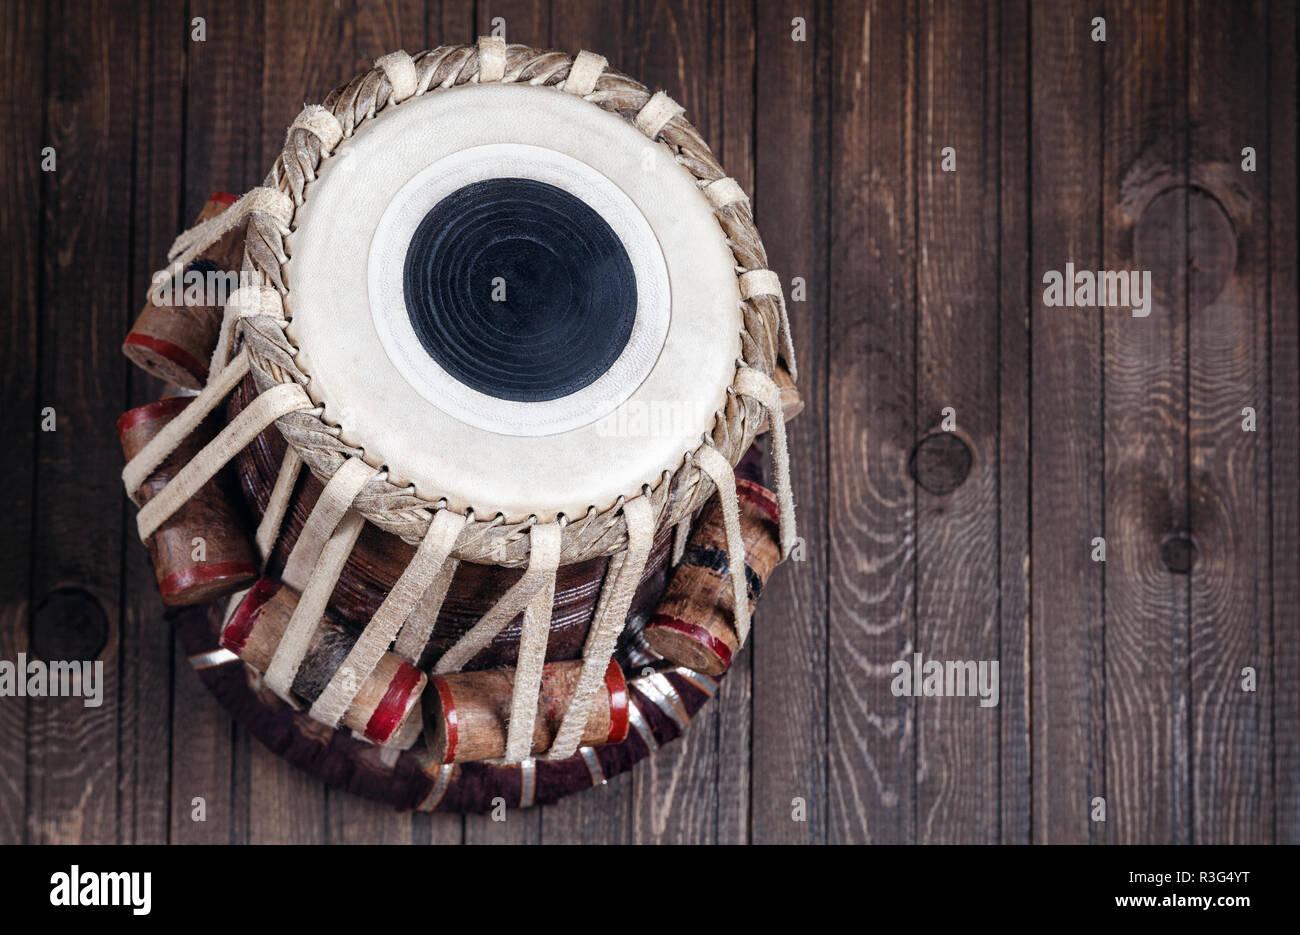 Tabla drum Indian classical music instrument close up - Stock Image